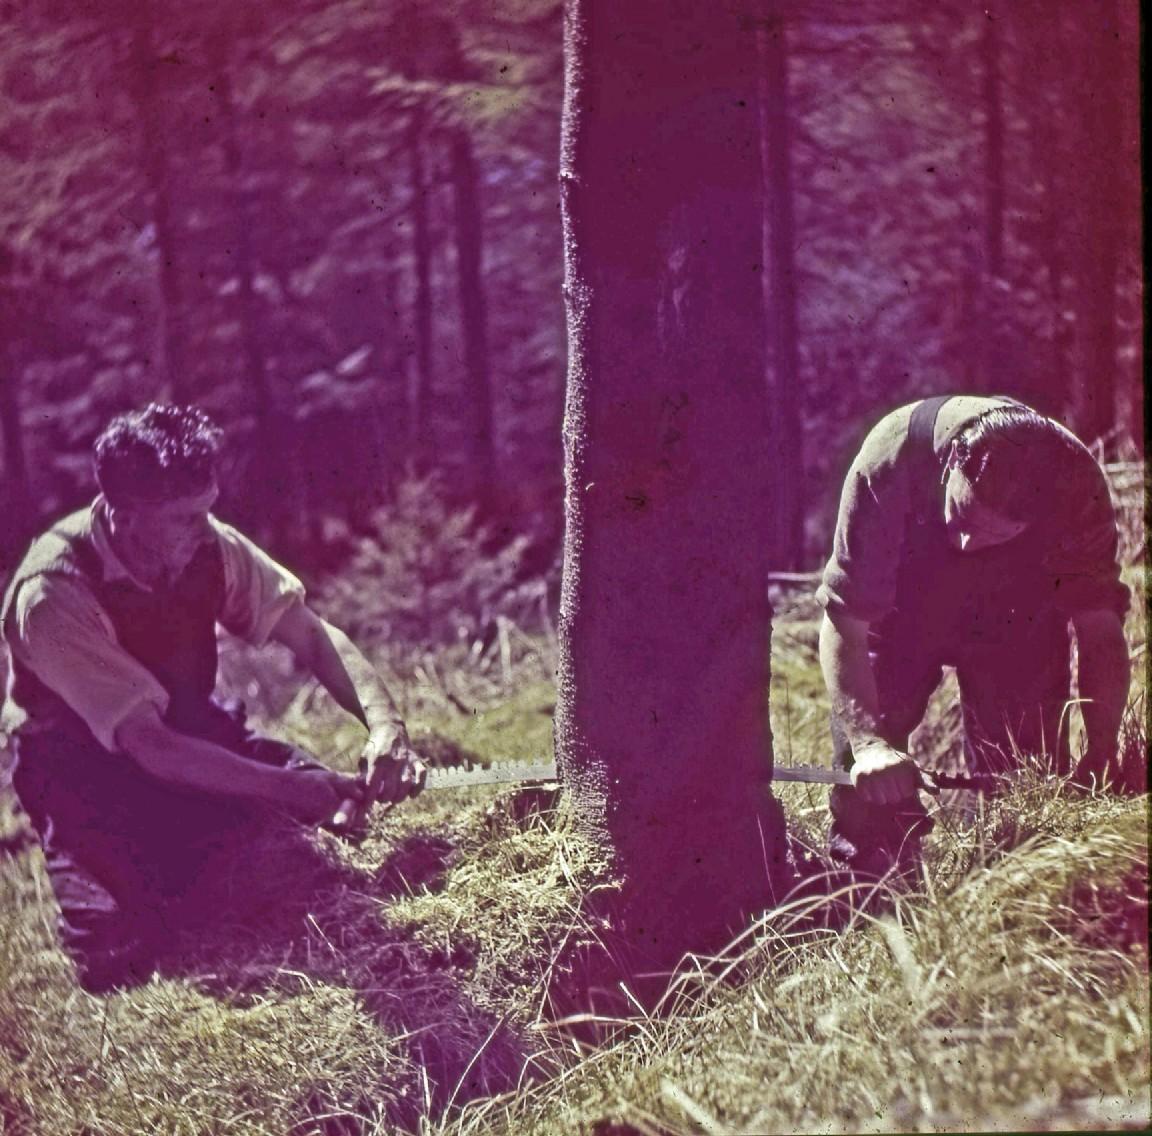 Manual felling with cross-cut saw, 1954